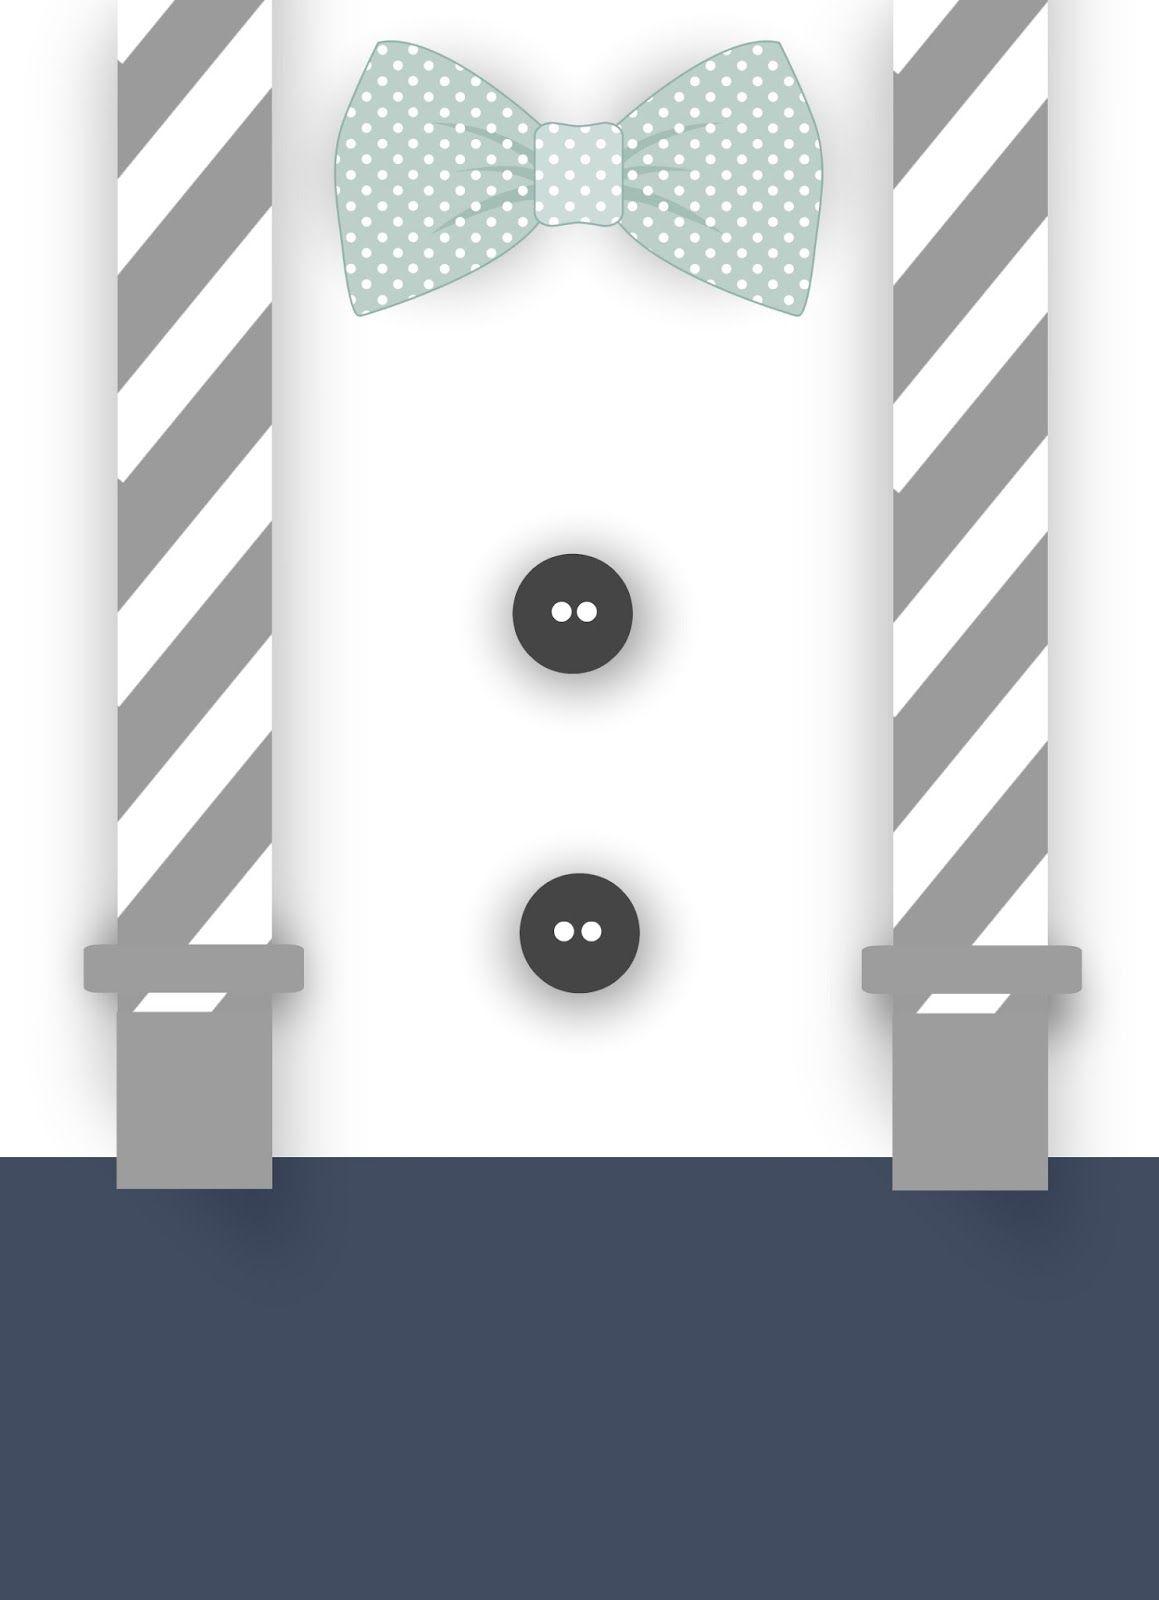 Little Man Baby Shower Template Baby Shower Templates Bow Tie Baby Shower Baby Shower Invitations For Boys